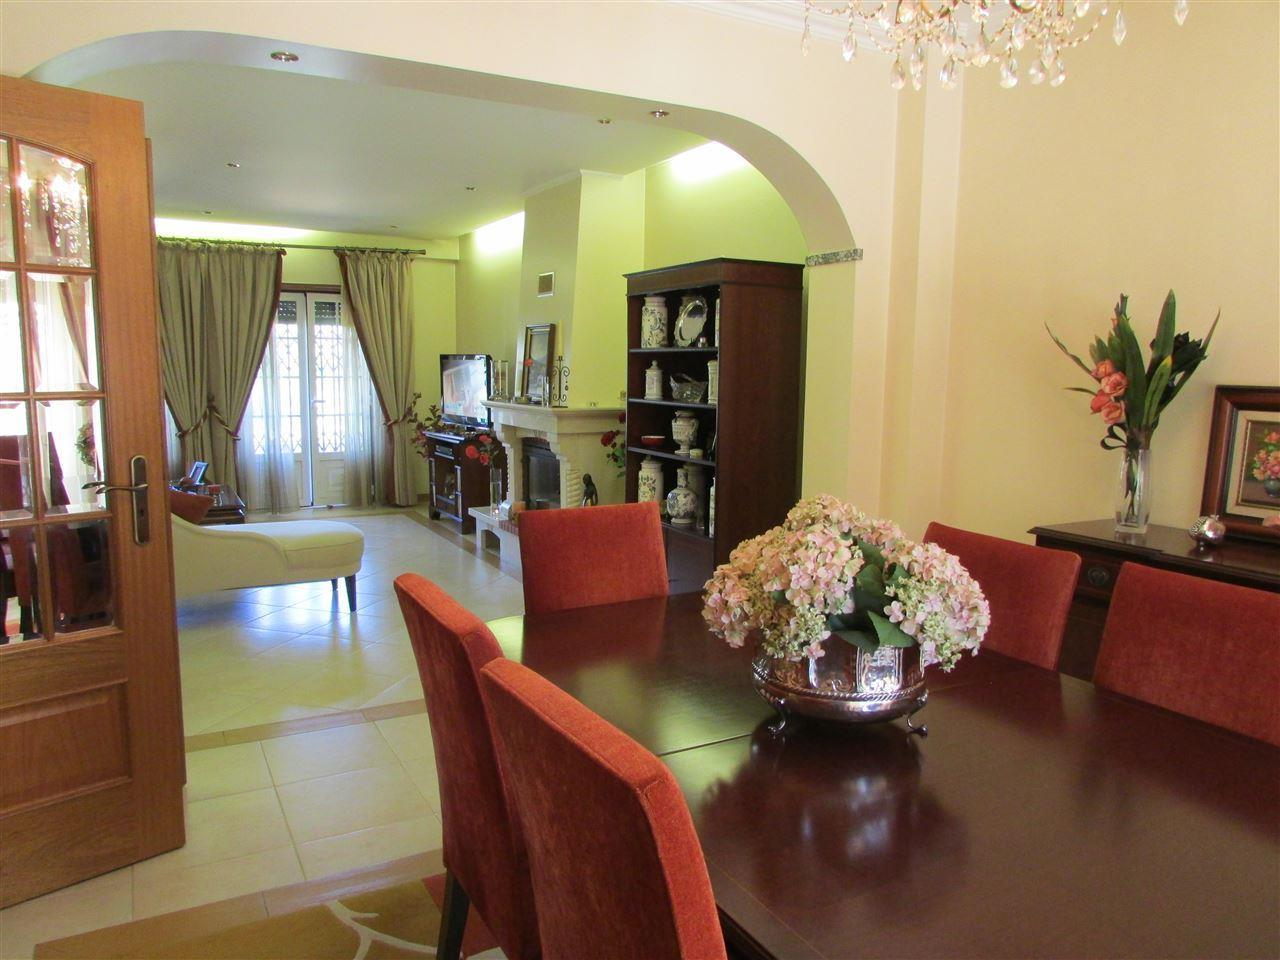 Einfamilienhaus für Verkauf beim Terraced house, 4 bedrooms, for Sale Cascais, Lissabon Portugal